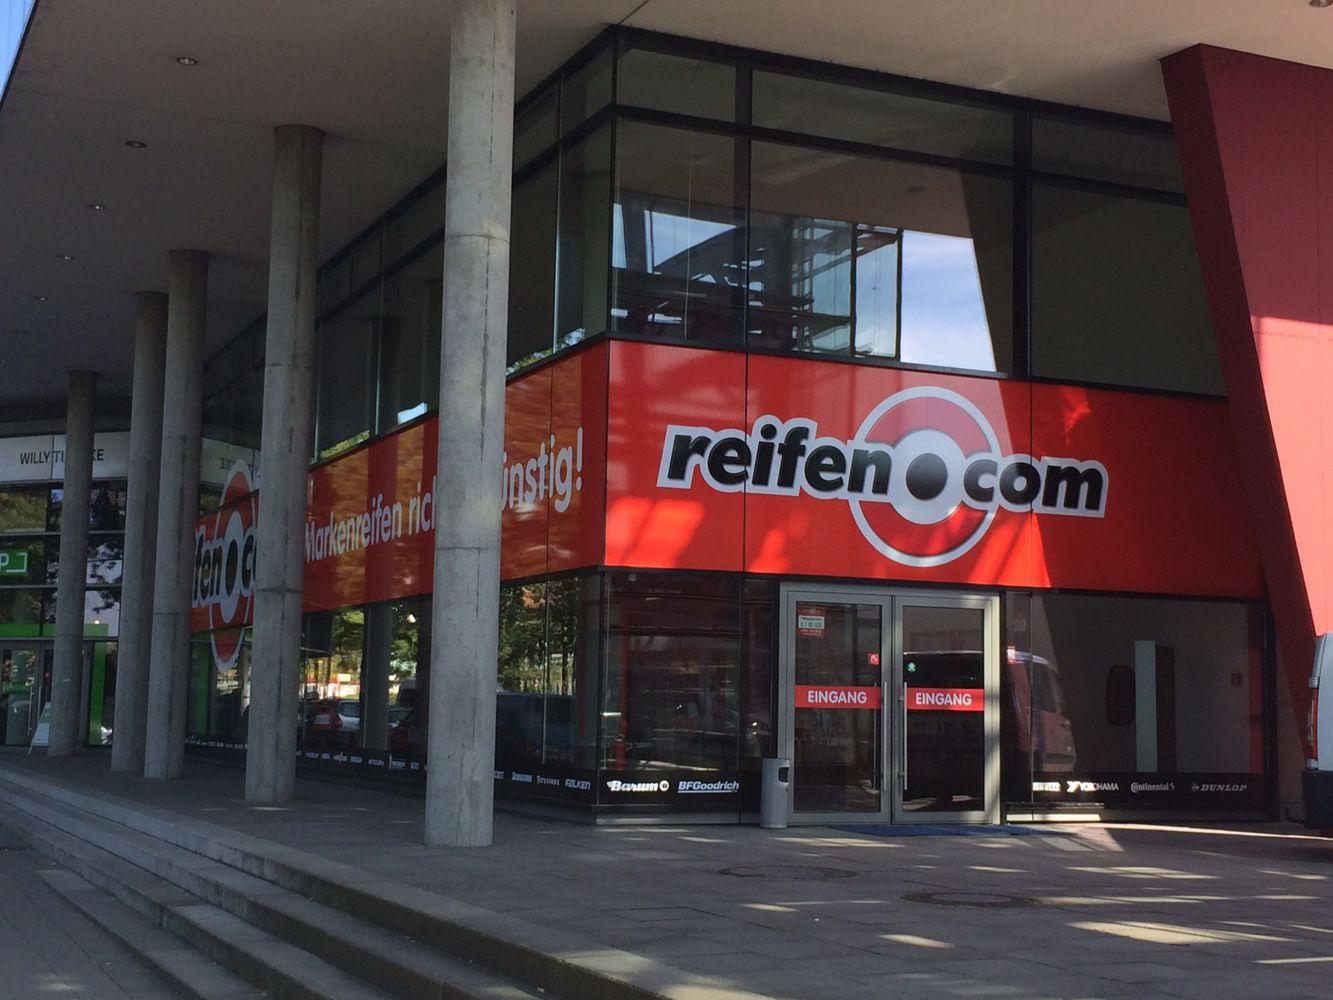 Reifenservice reifencom GmbH in Hamburg Wandsbek  reifen.com